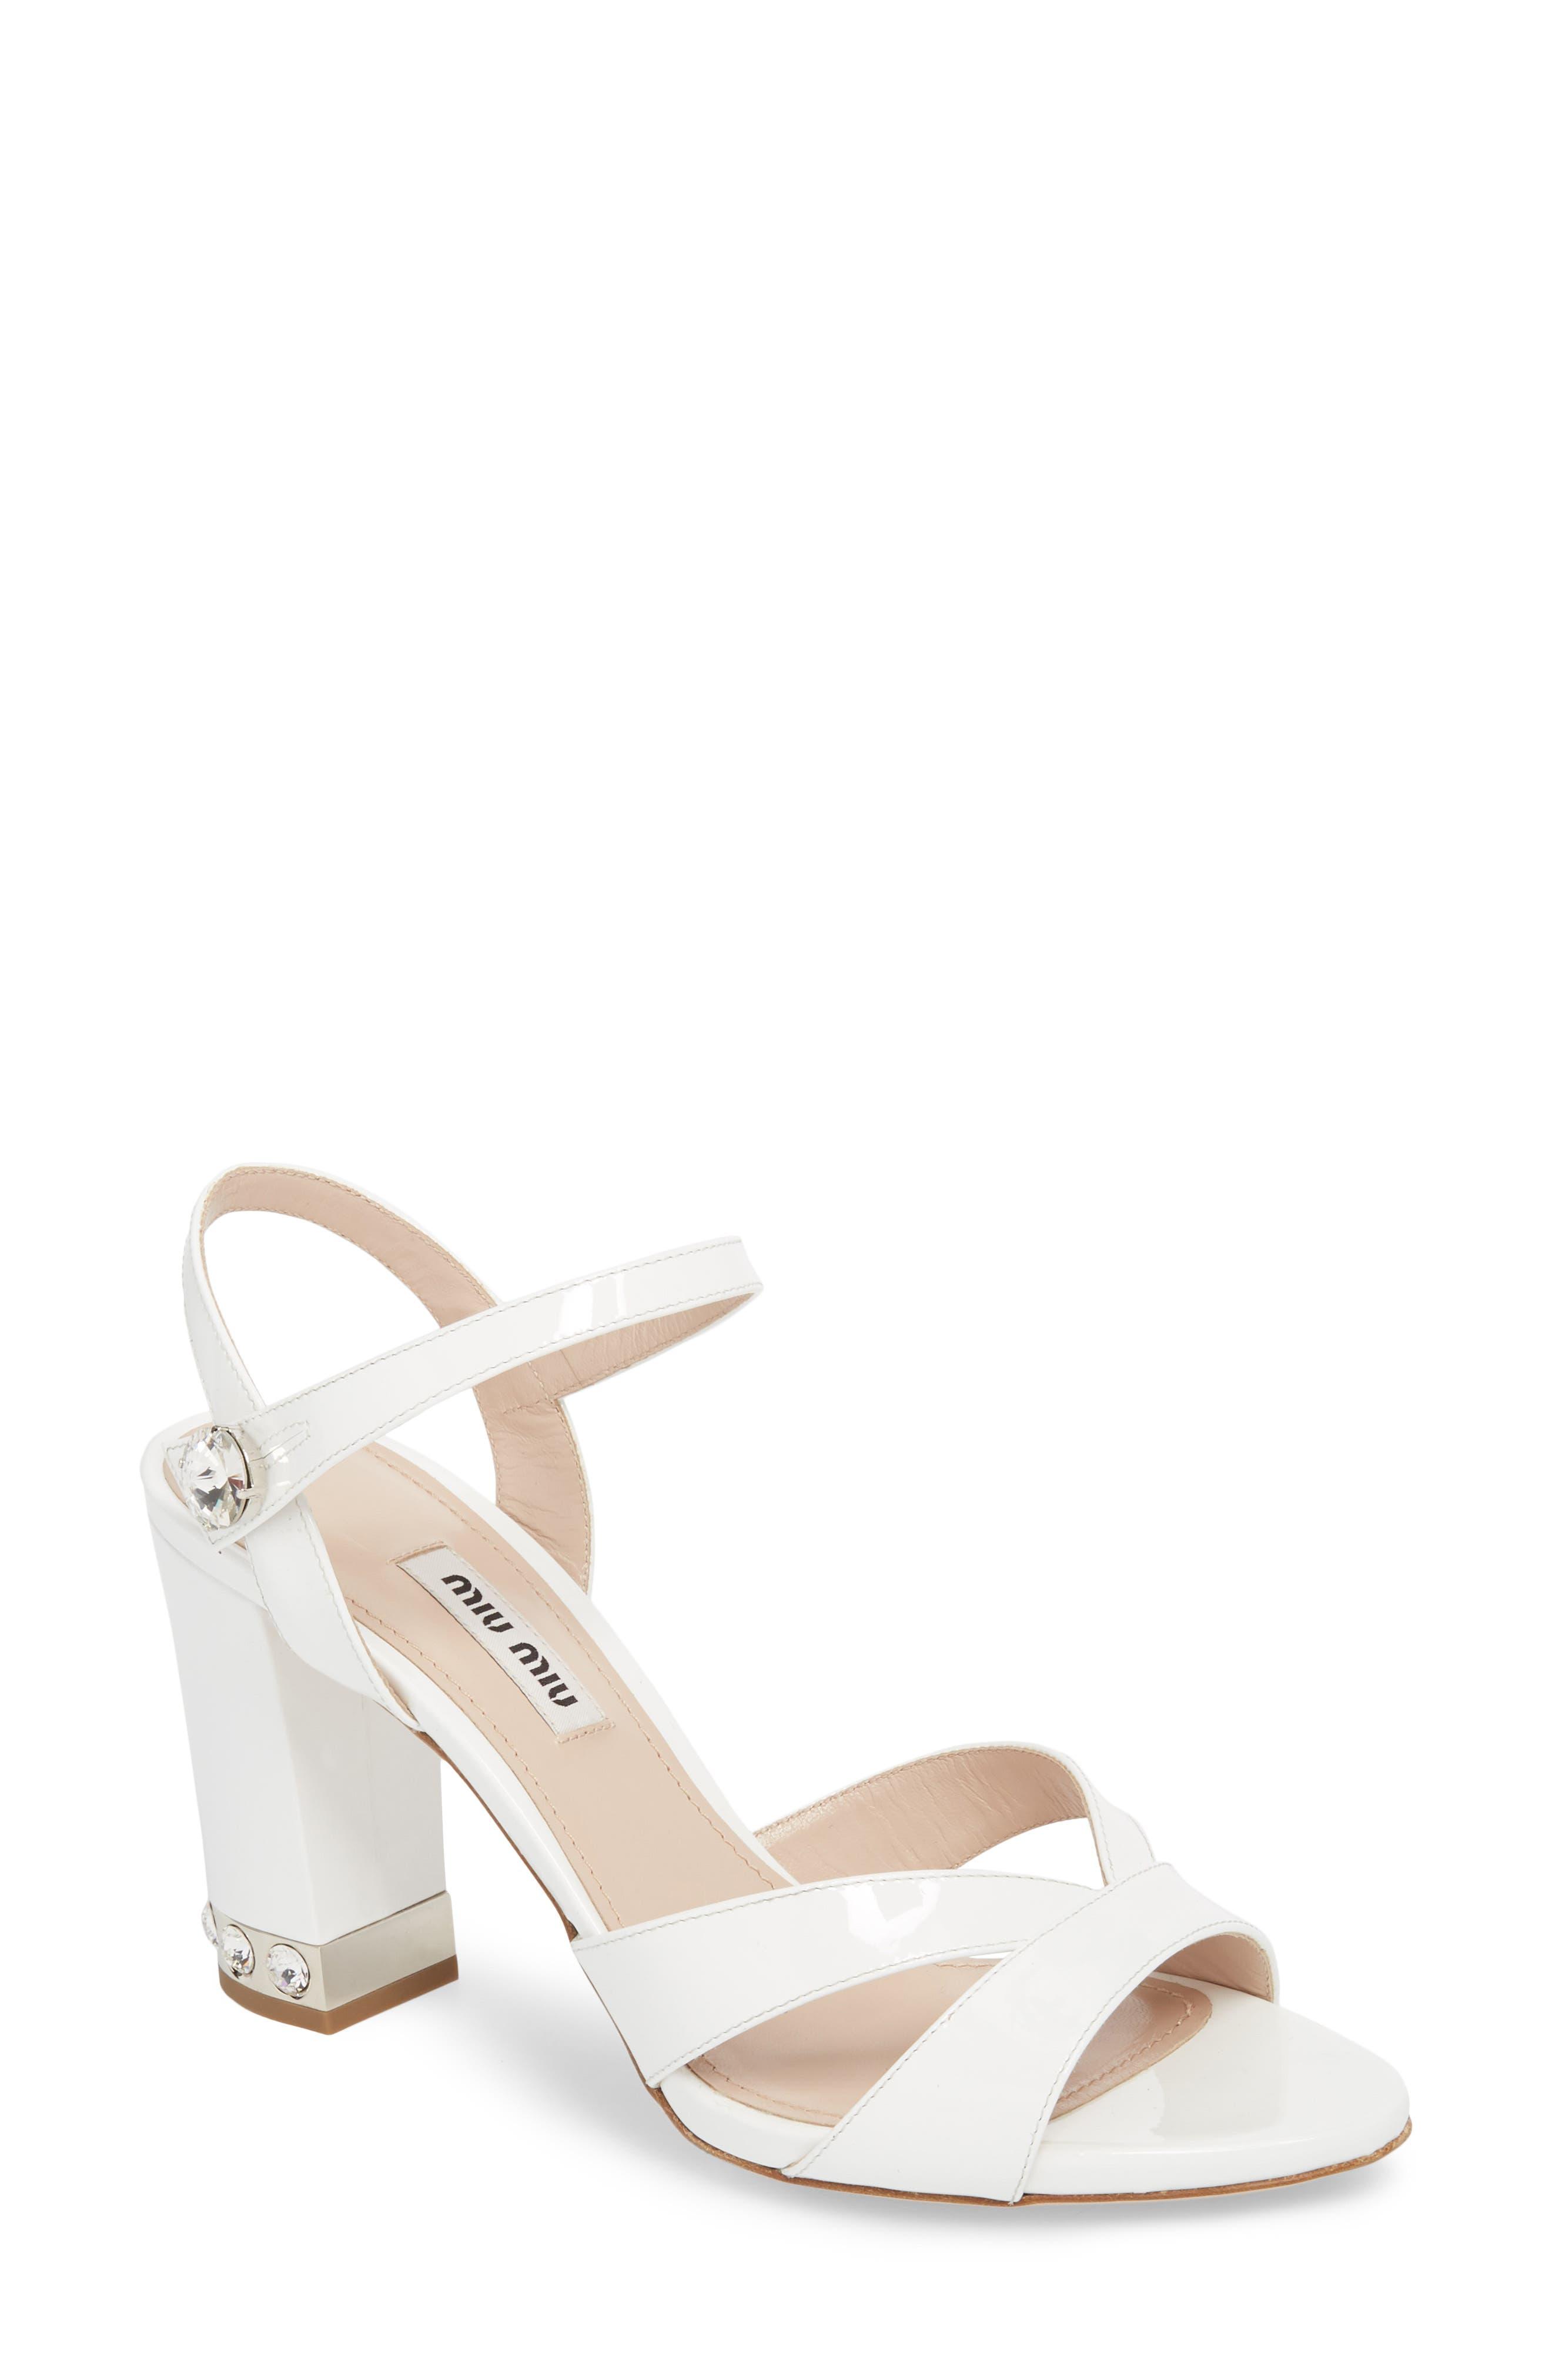 Miu Miu Jeweled Heel Sandal (Women)